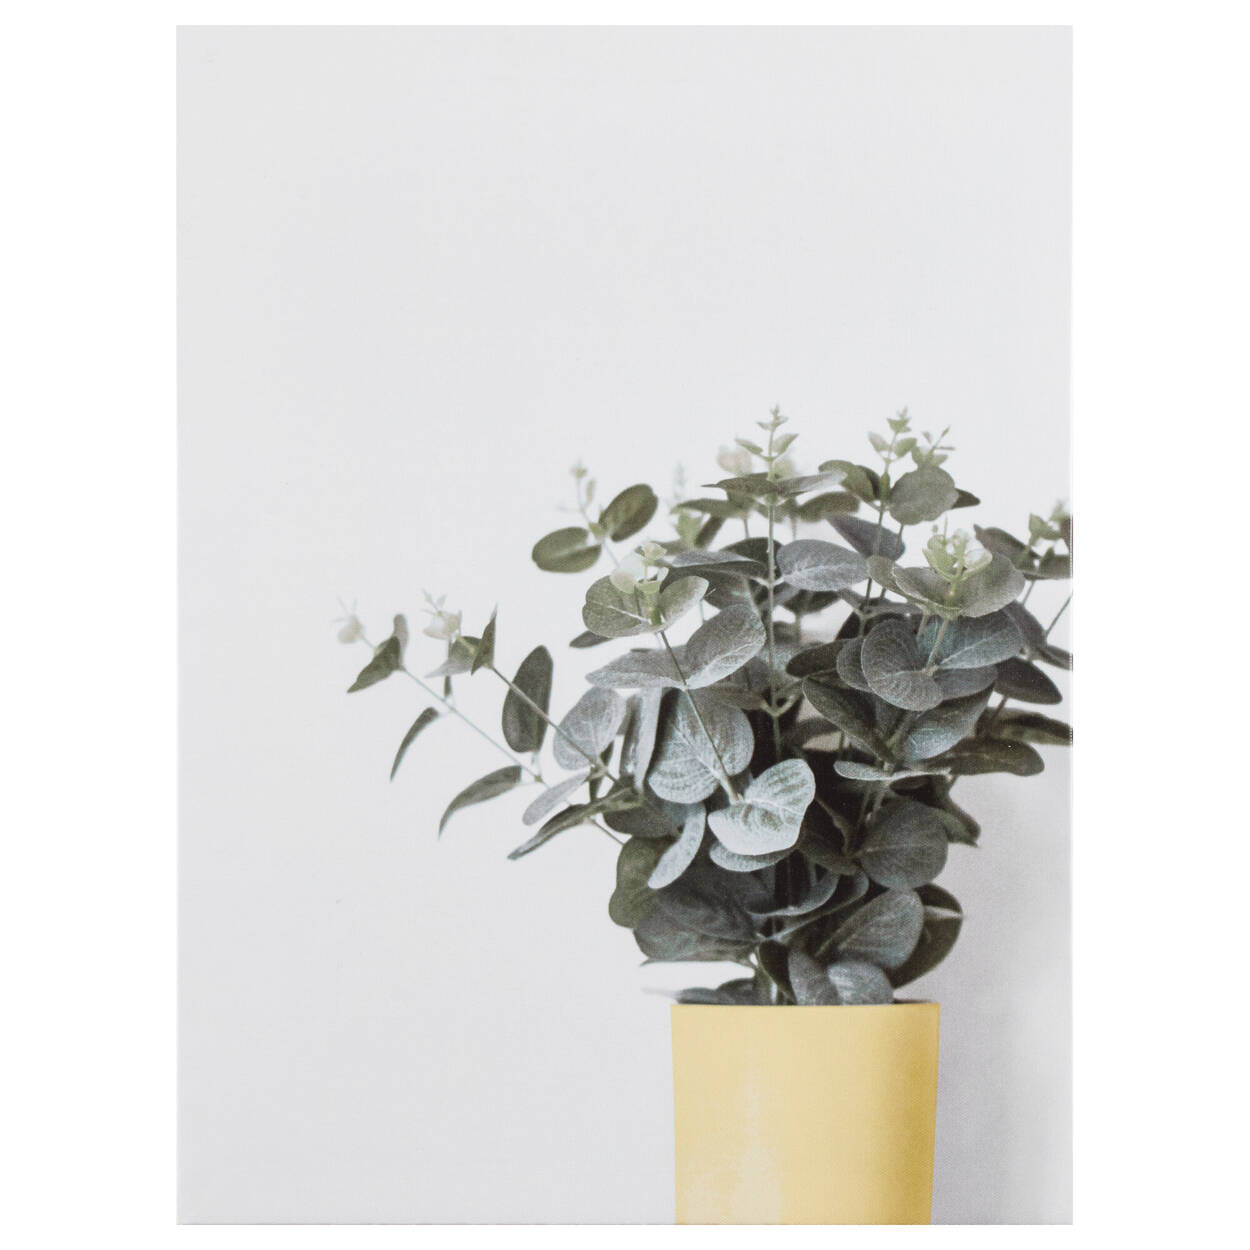 Tableau imprimé eucalyptus simplement vert